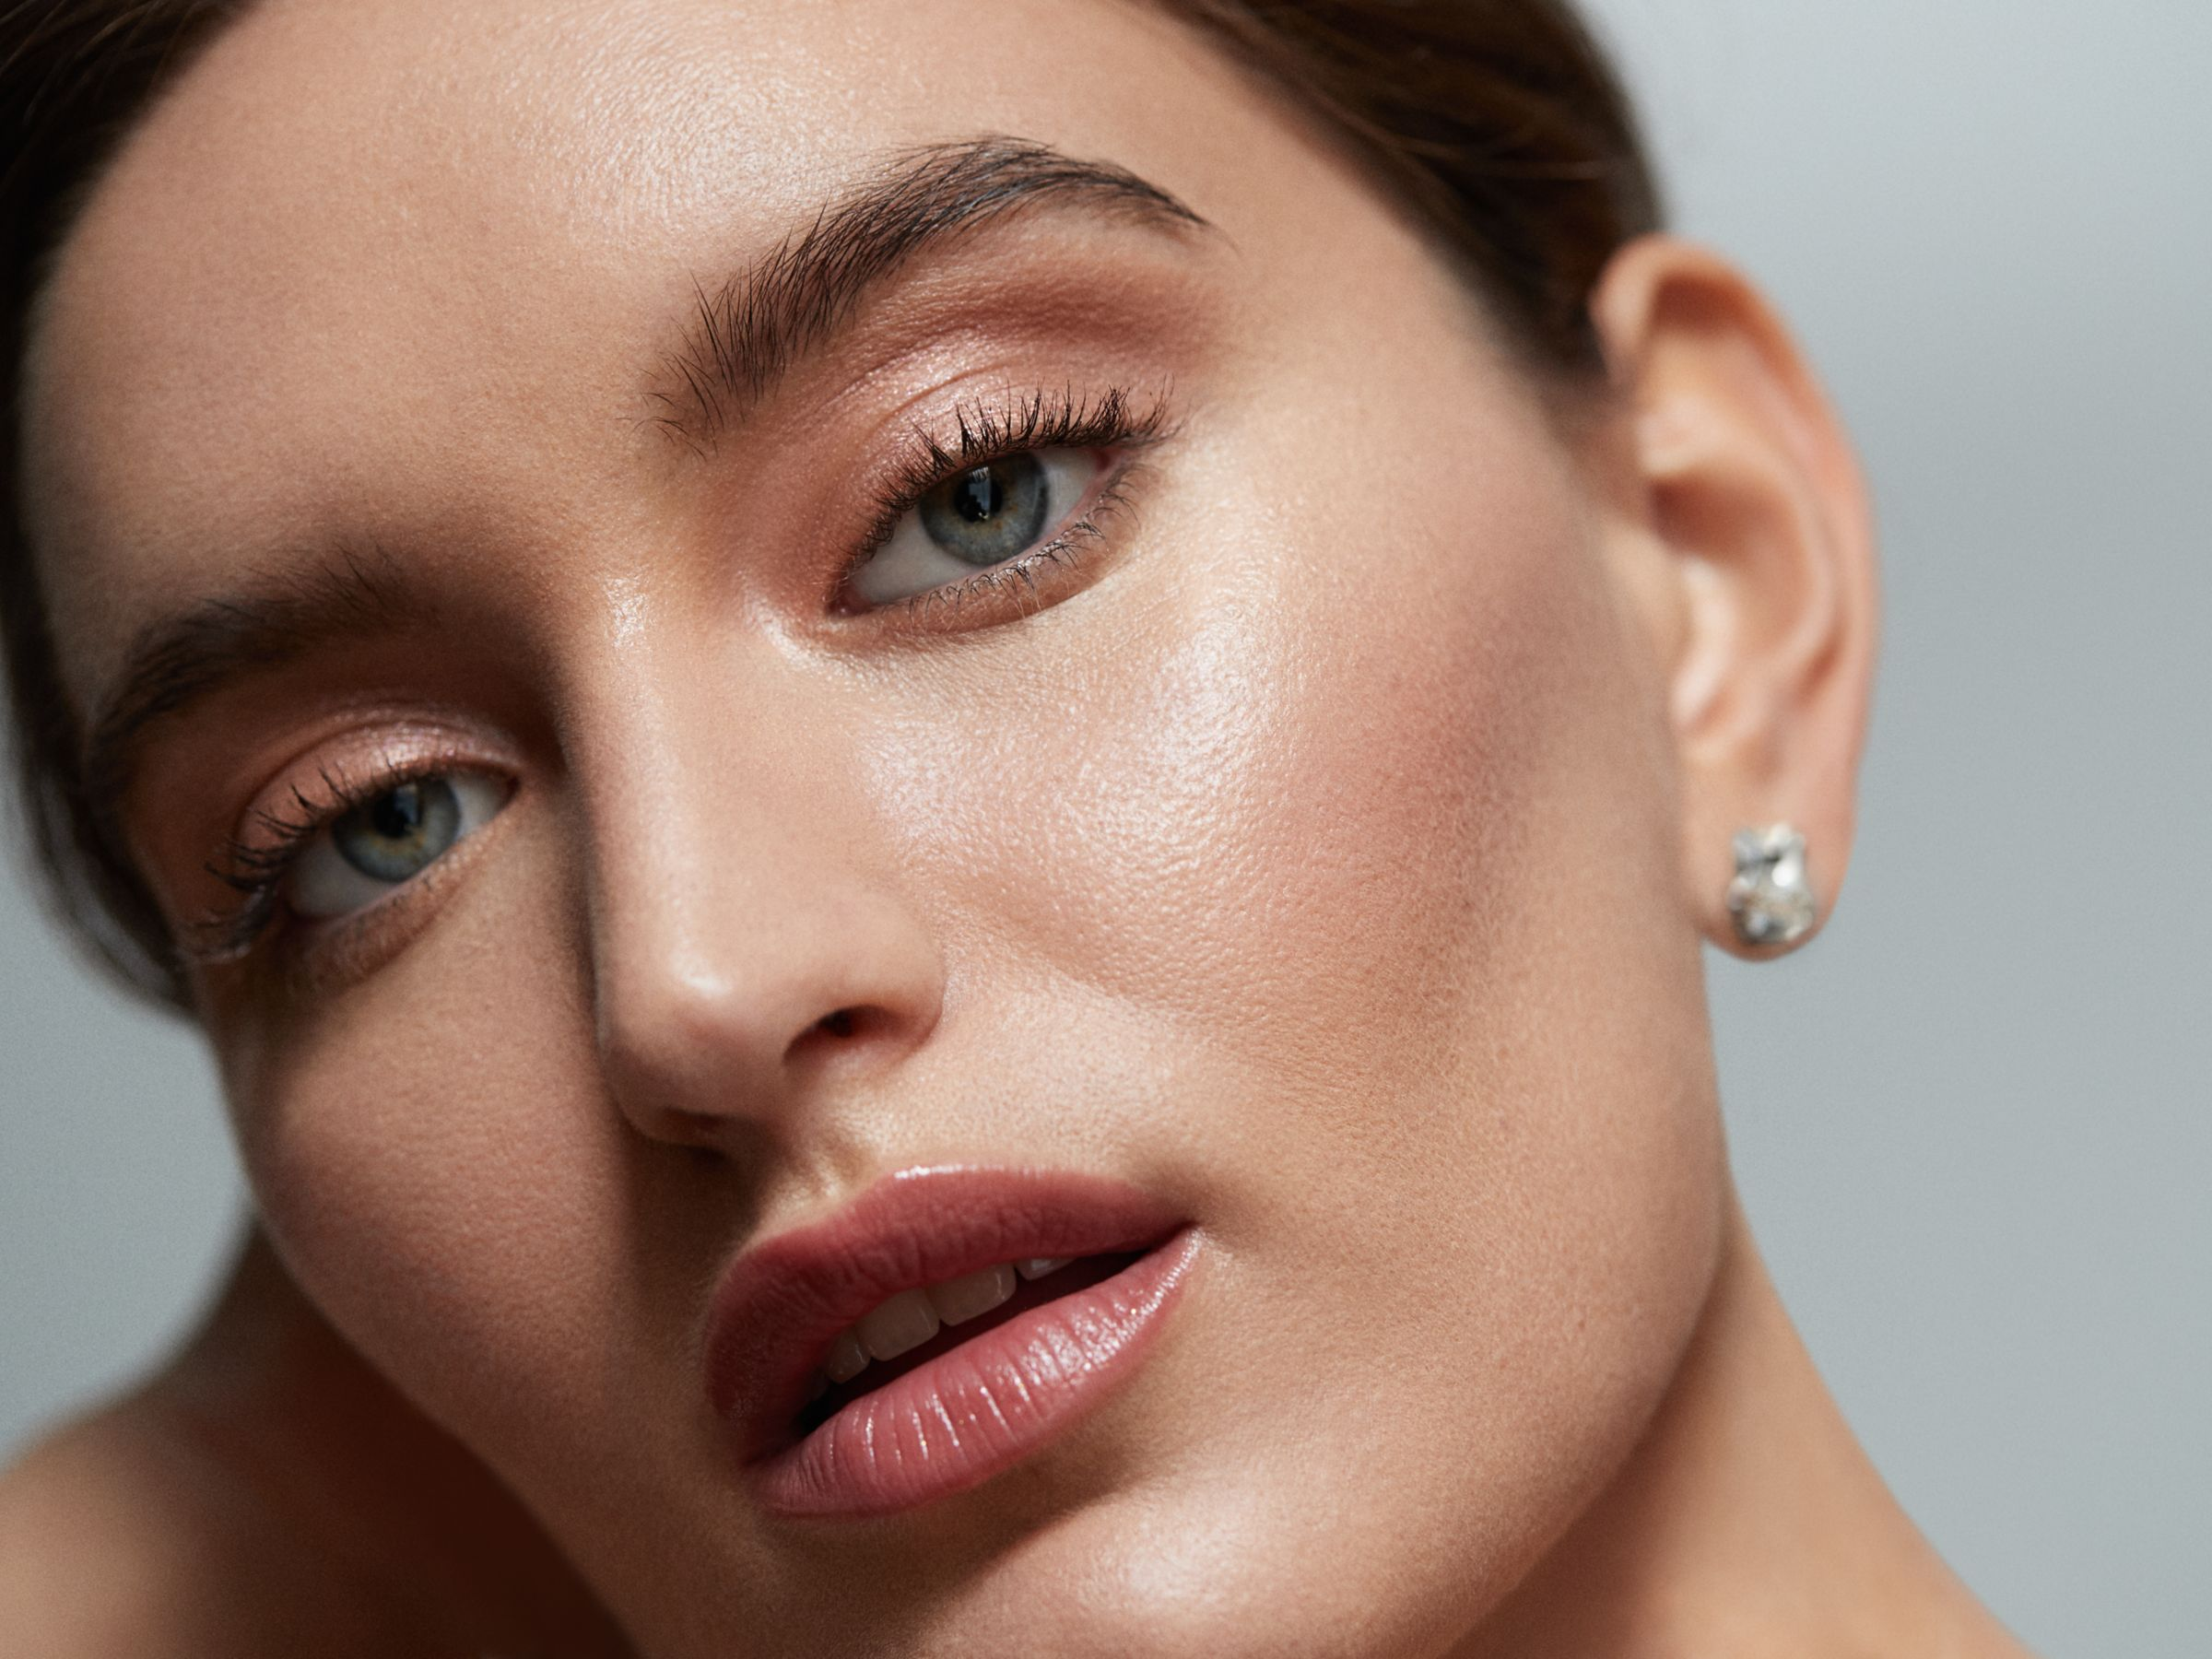 Natrual glowing make-up look